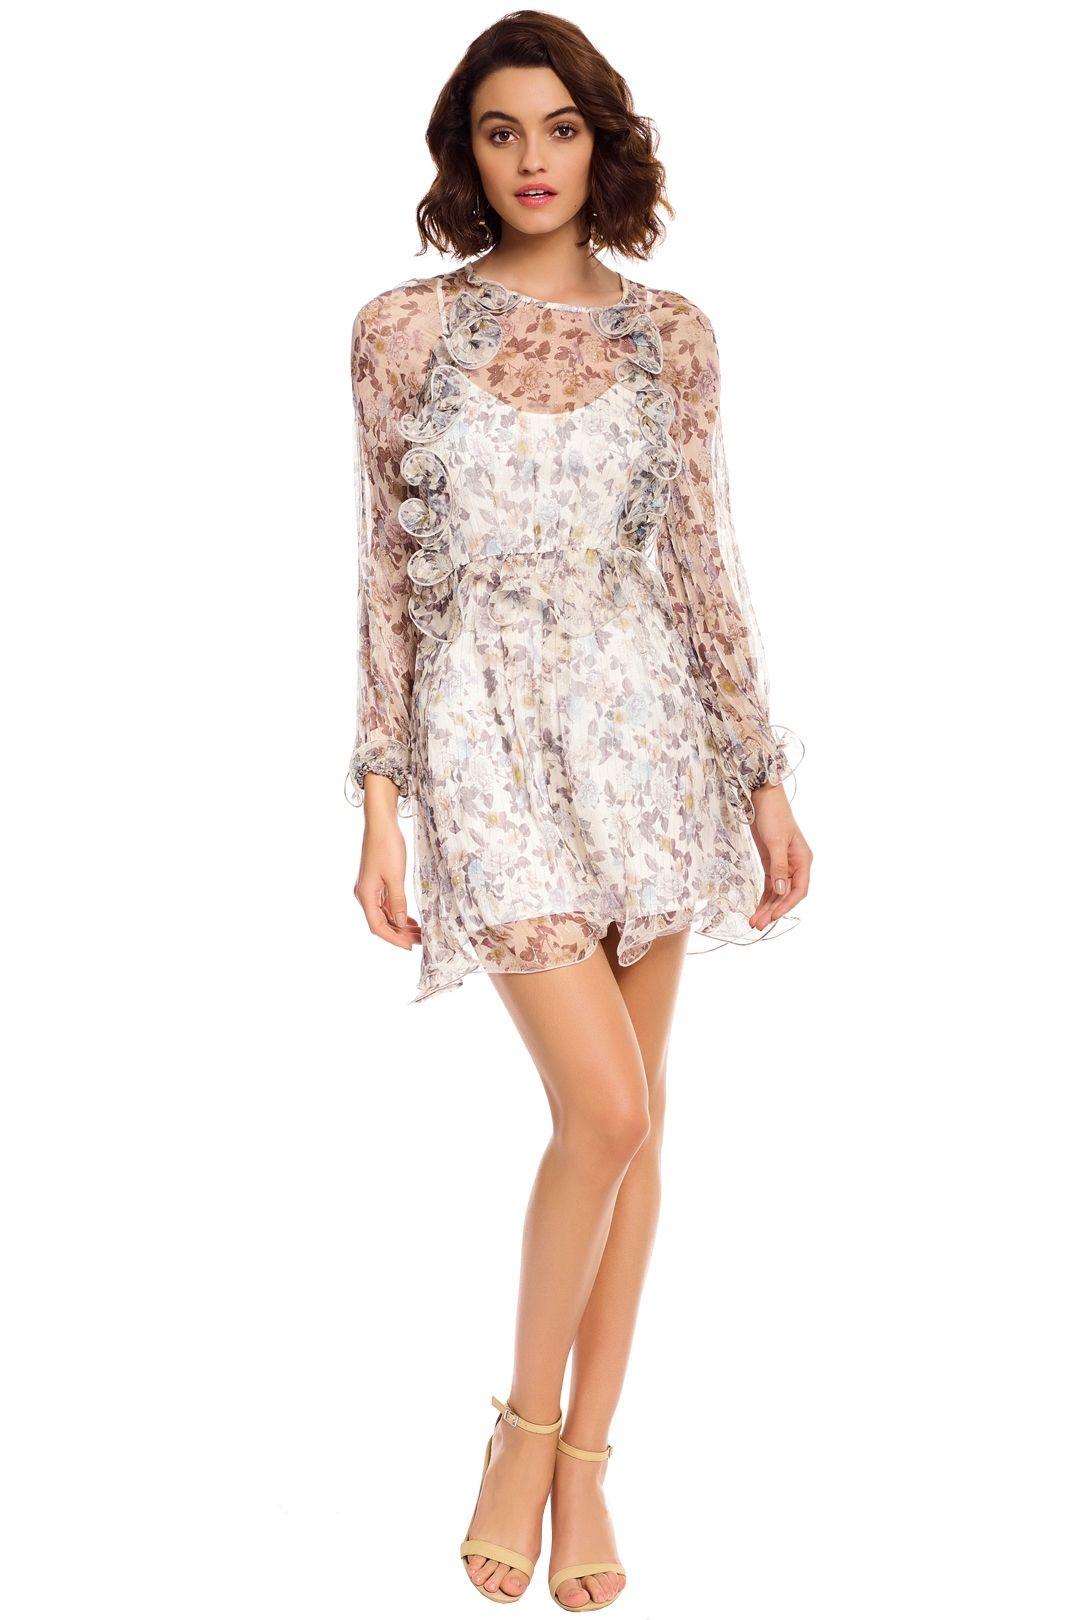 Talulah - Provacateur LS Mini Dress - Ivory Floral Silk - Front